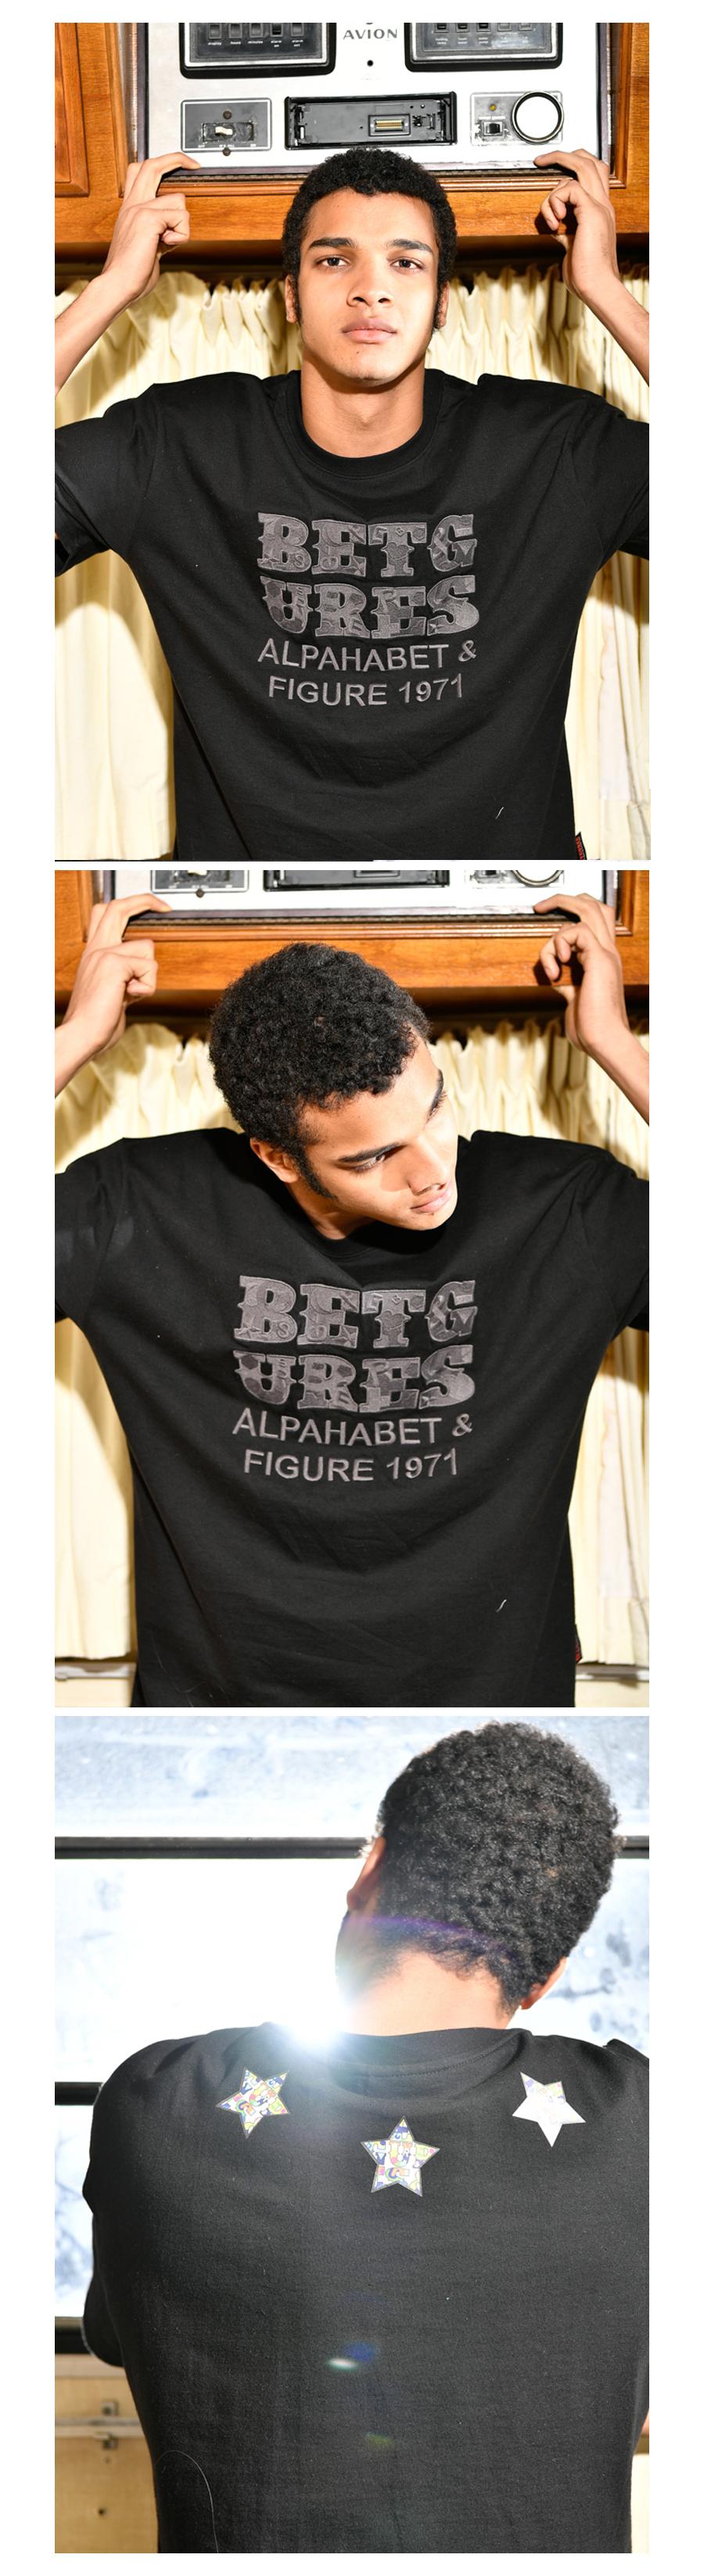 B1TS-05-01.jpg